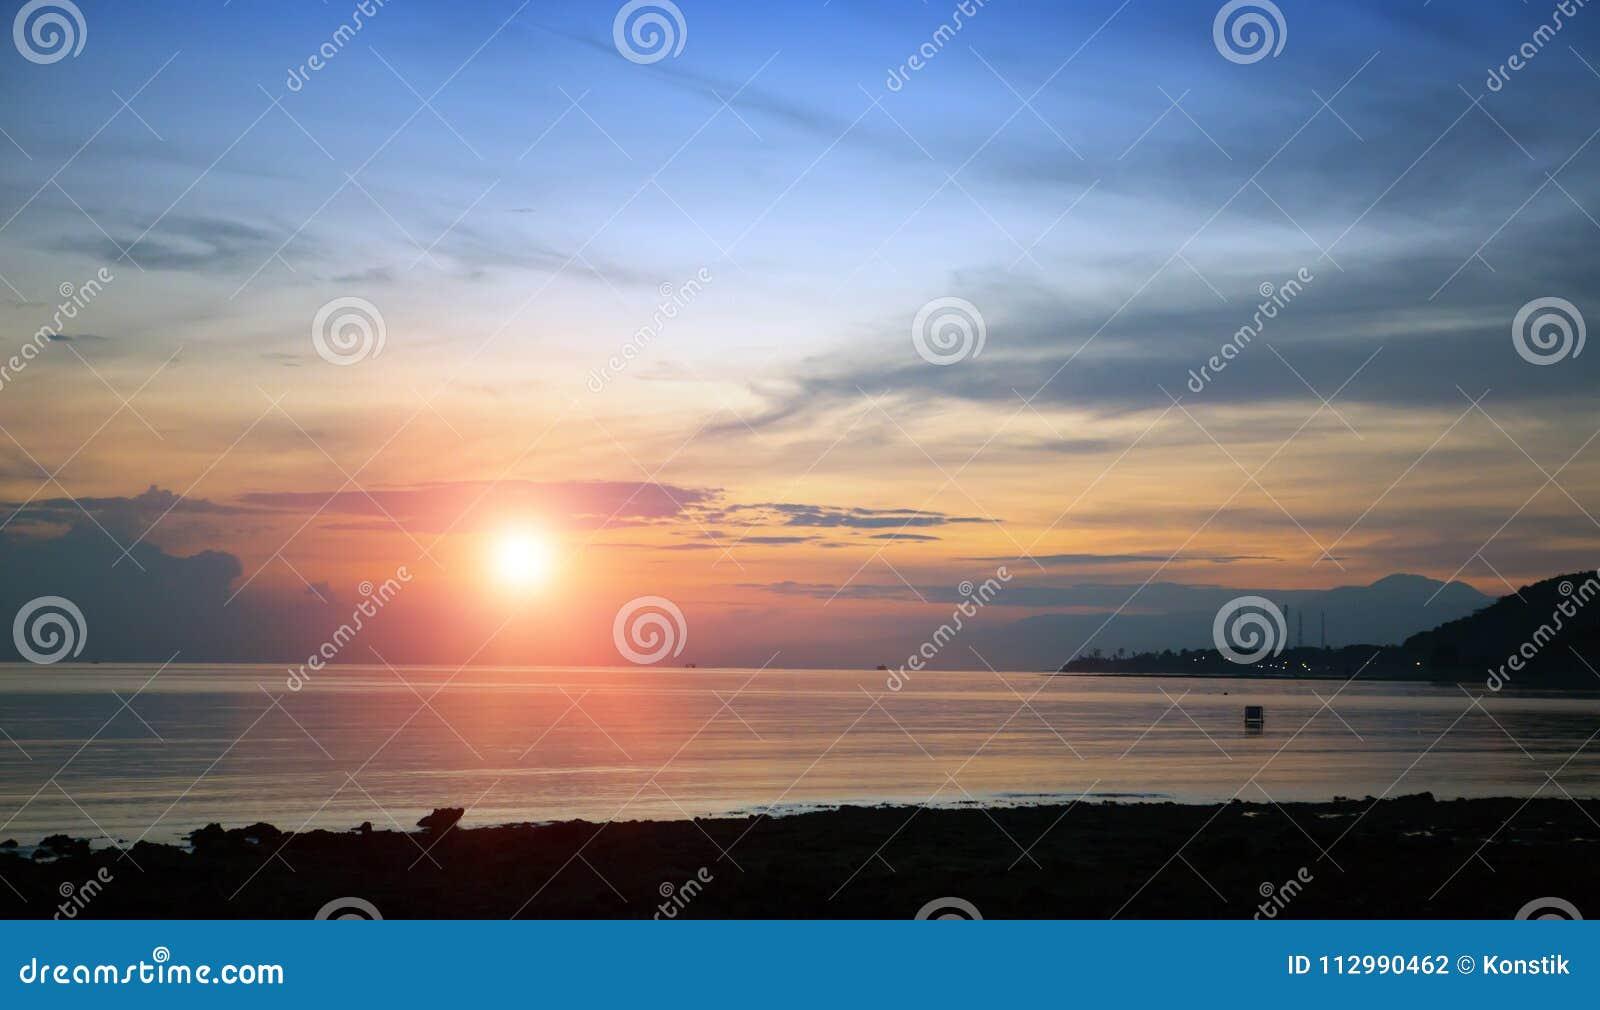 Stony seacoast on a sunset. Indonesia. Bali